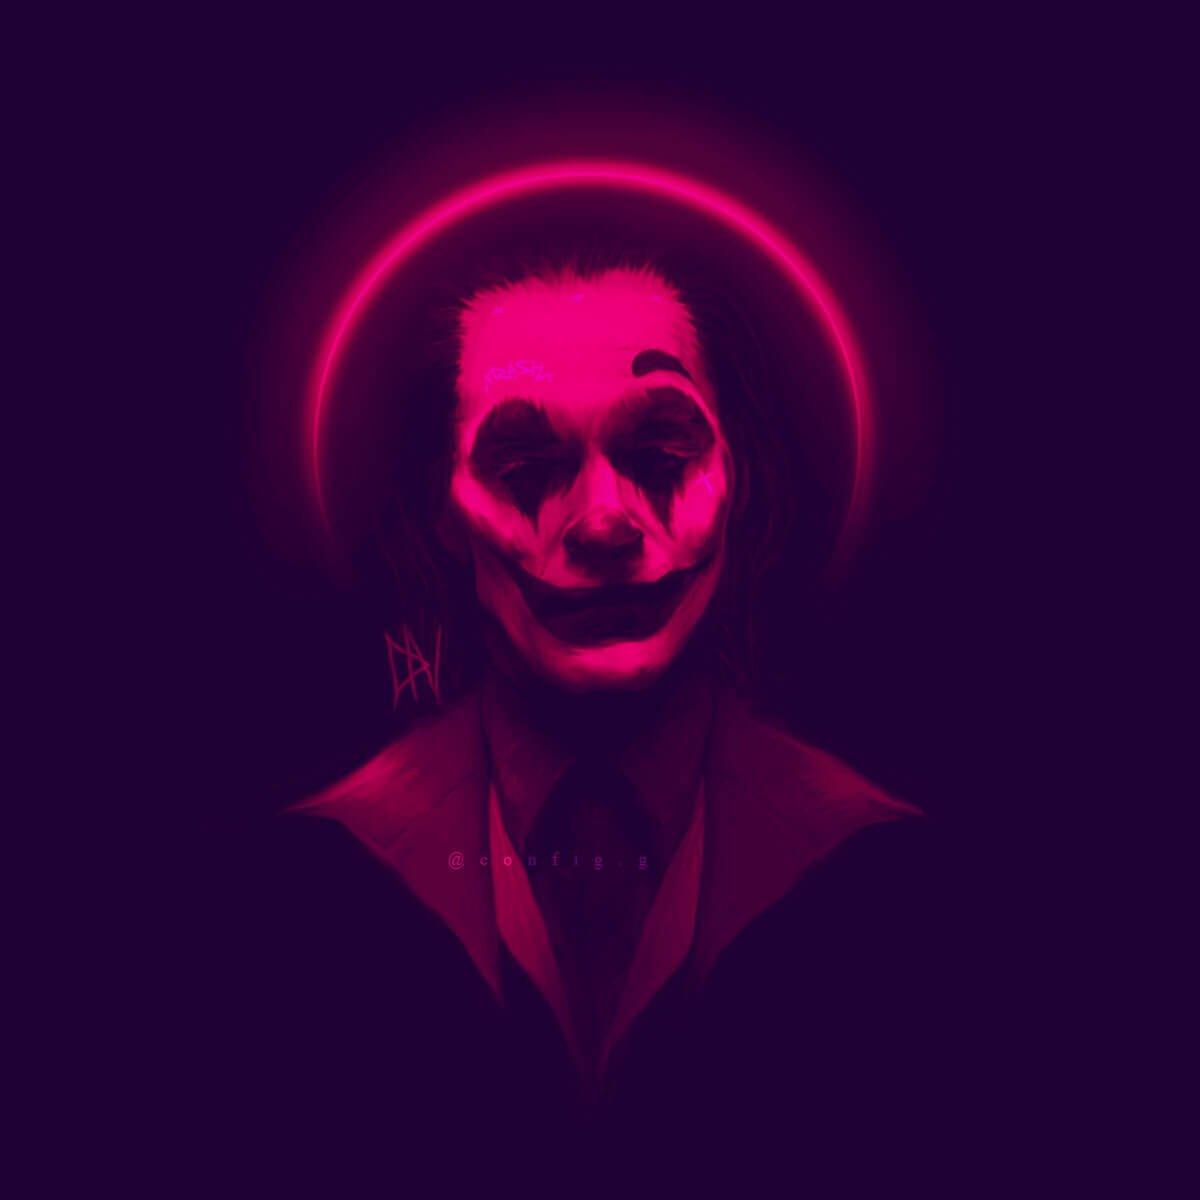 The Joker Art by Thomas .J